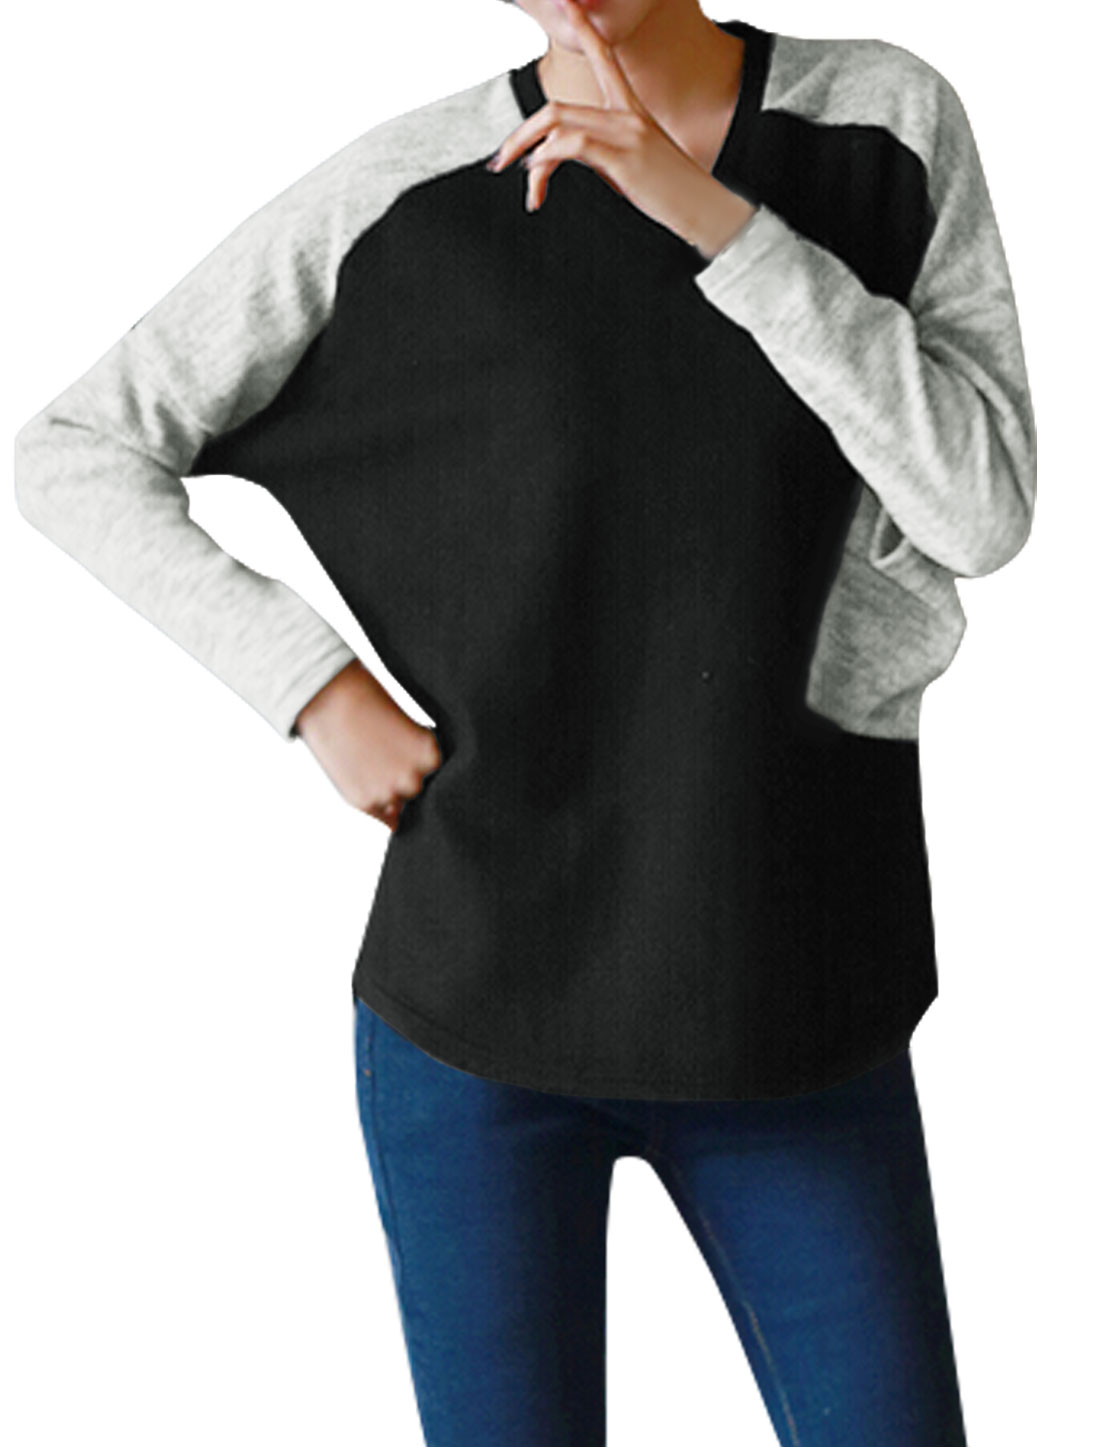 Ladies Contrast Color Batwing Tee Shirt w Pocket Black XS